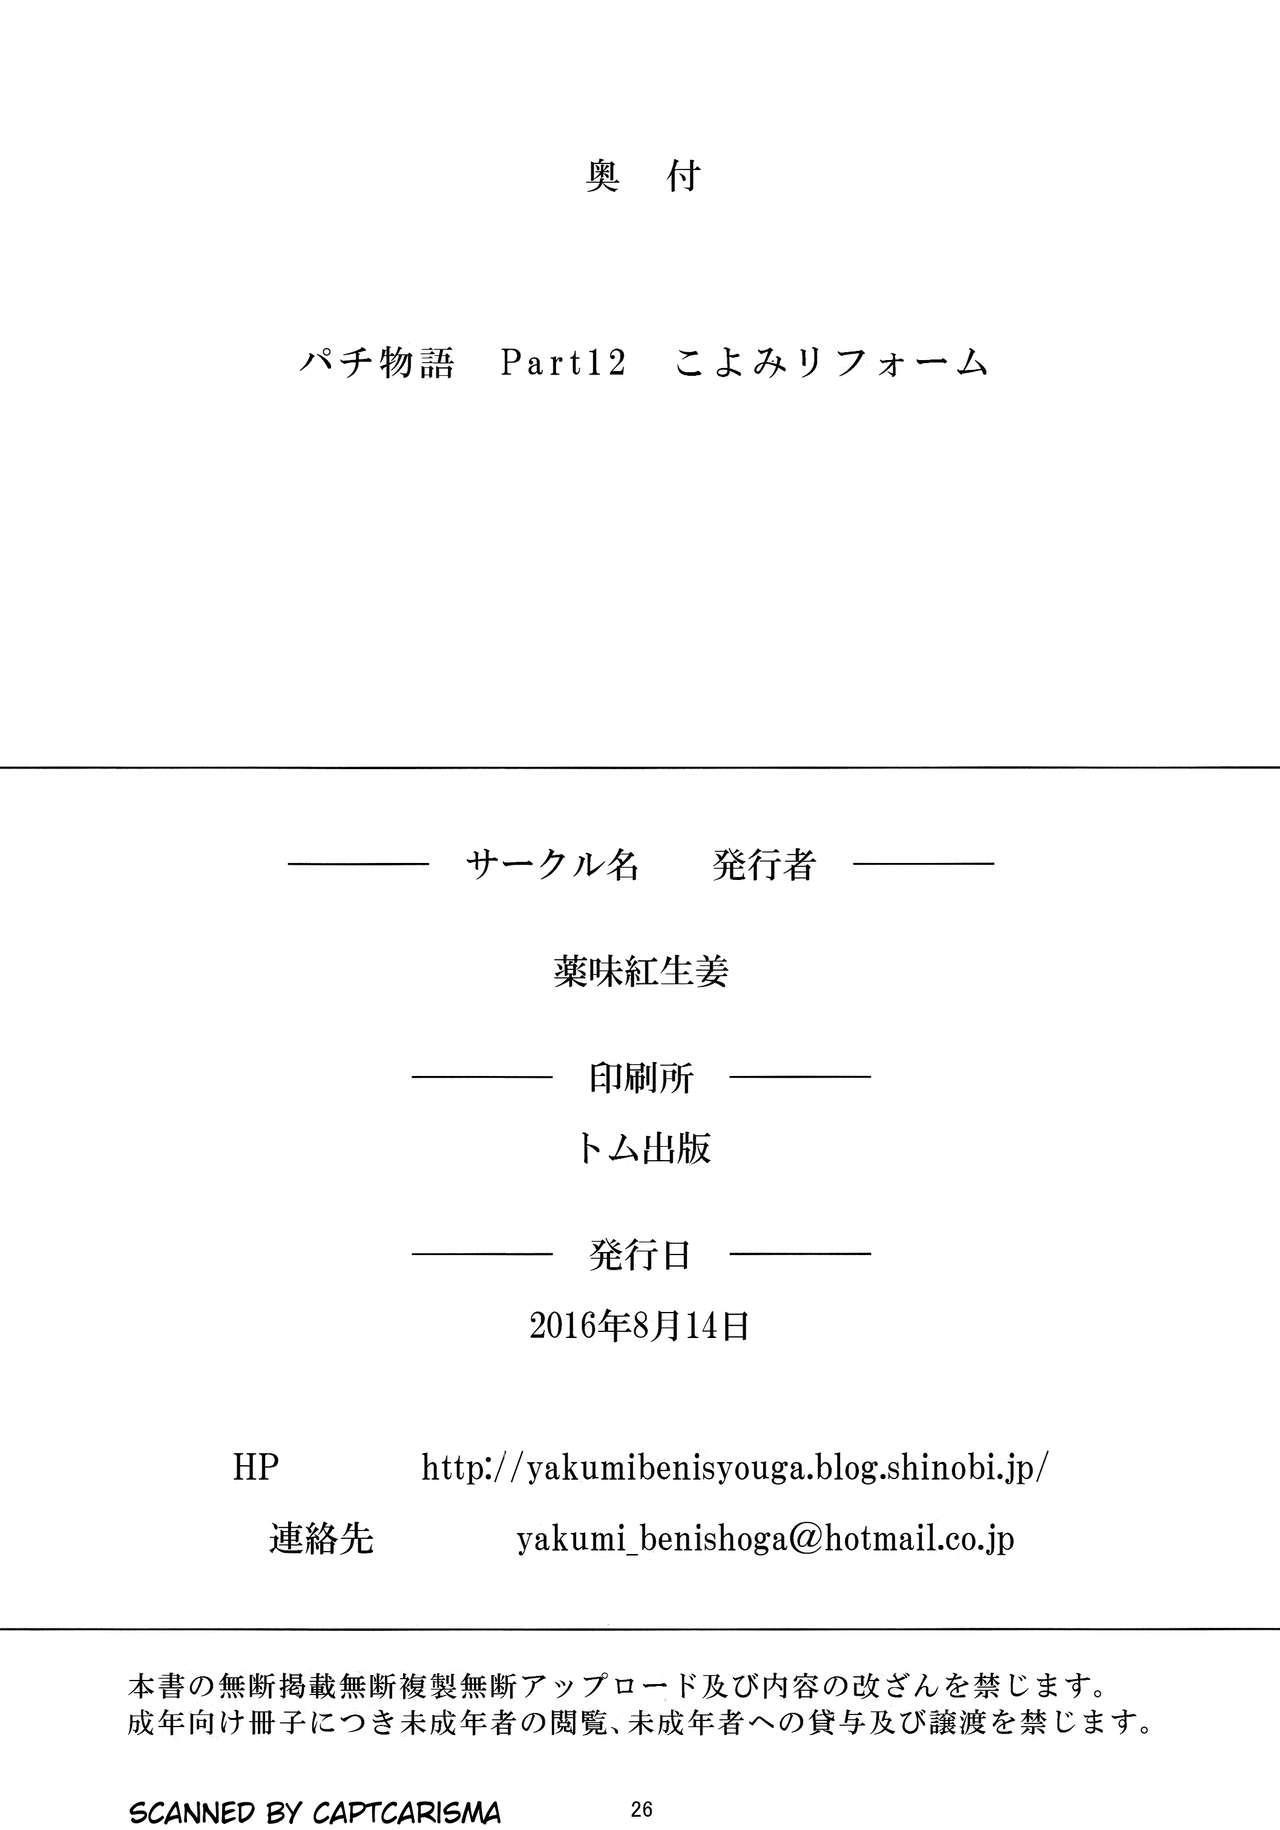 Pachimonogatari Part 12: Koyomi Reform 27